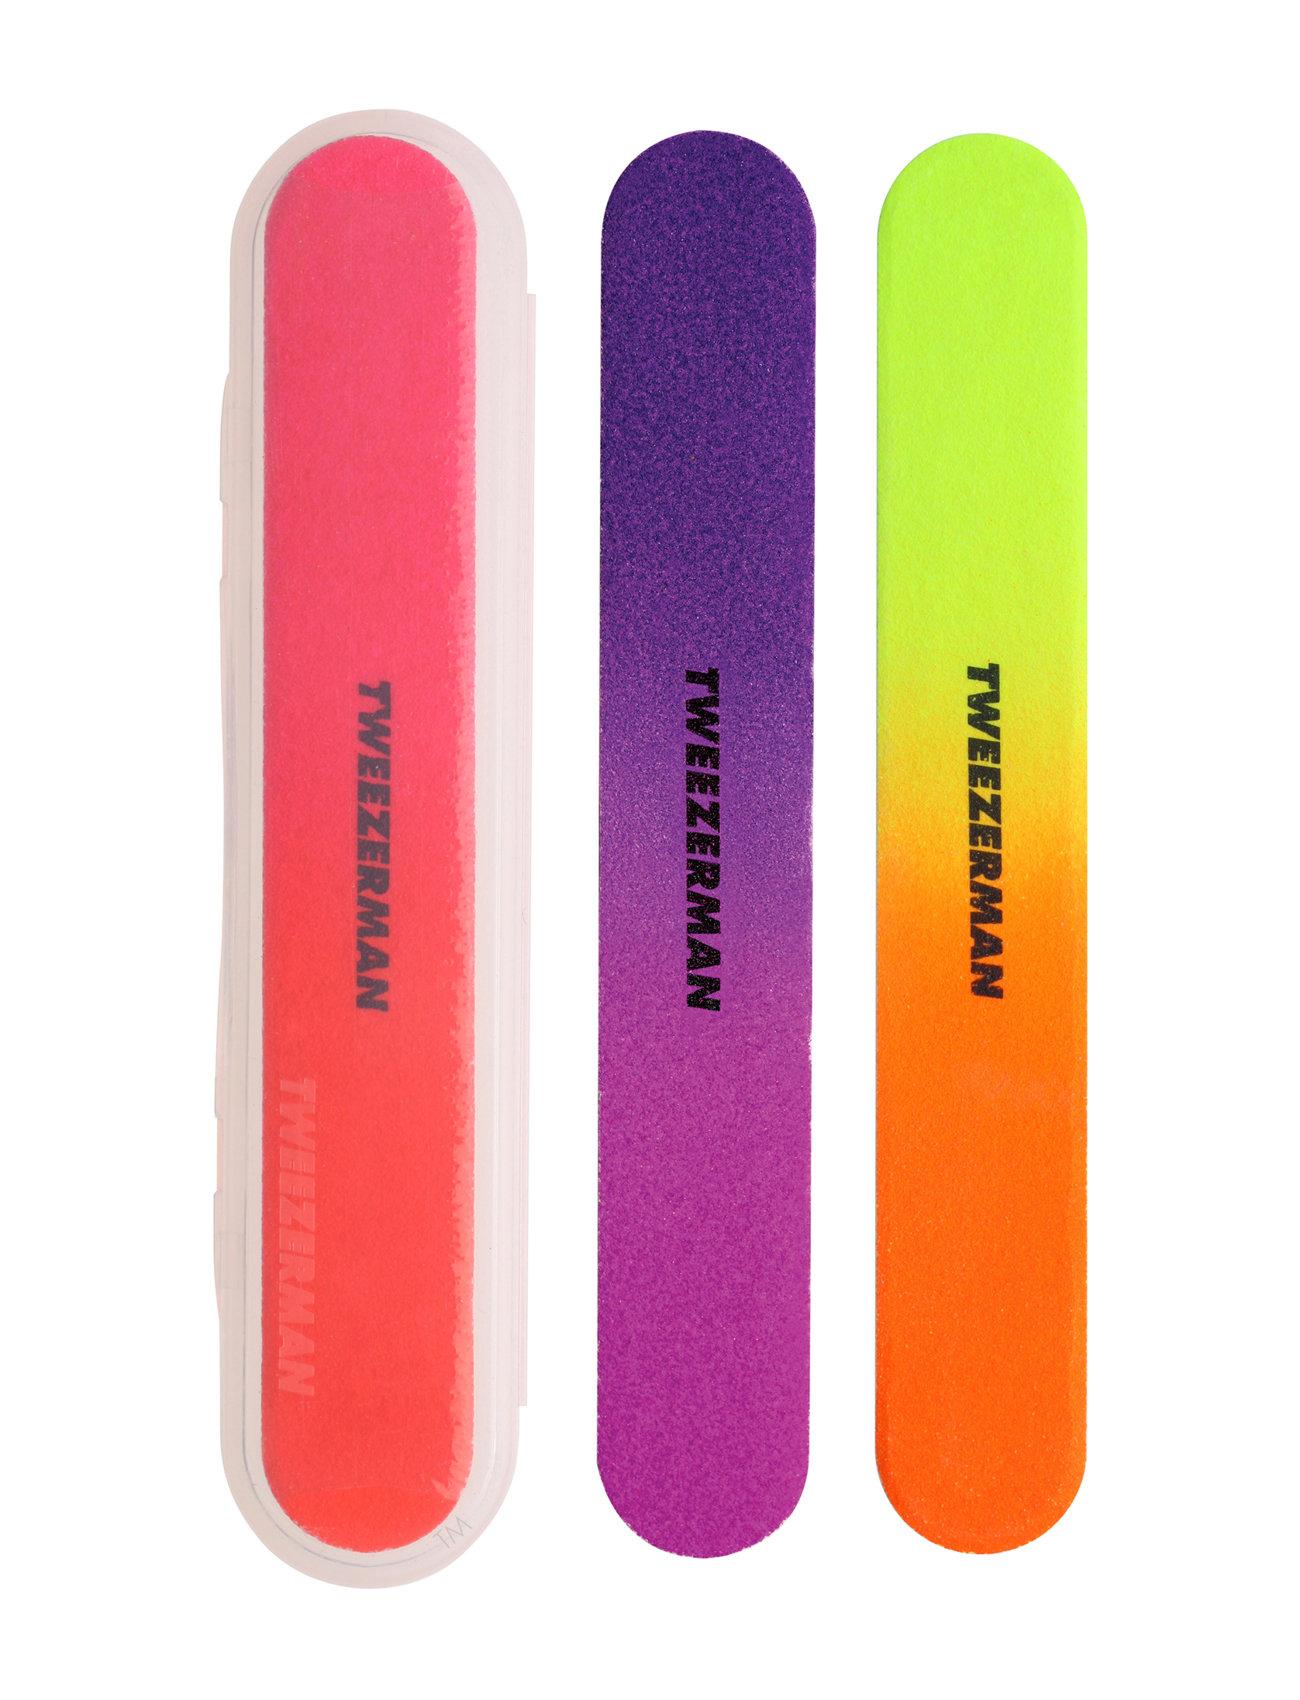 Neon Filemates - Tweezerman